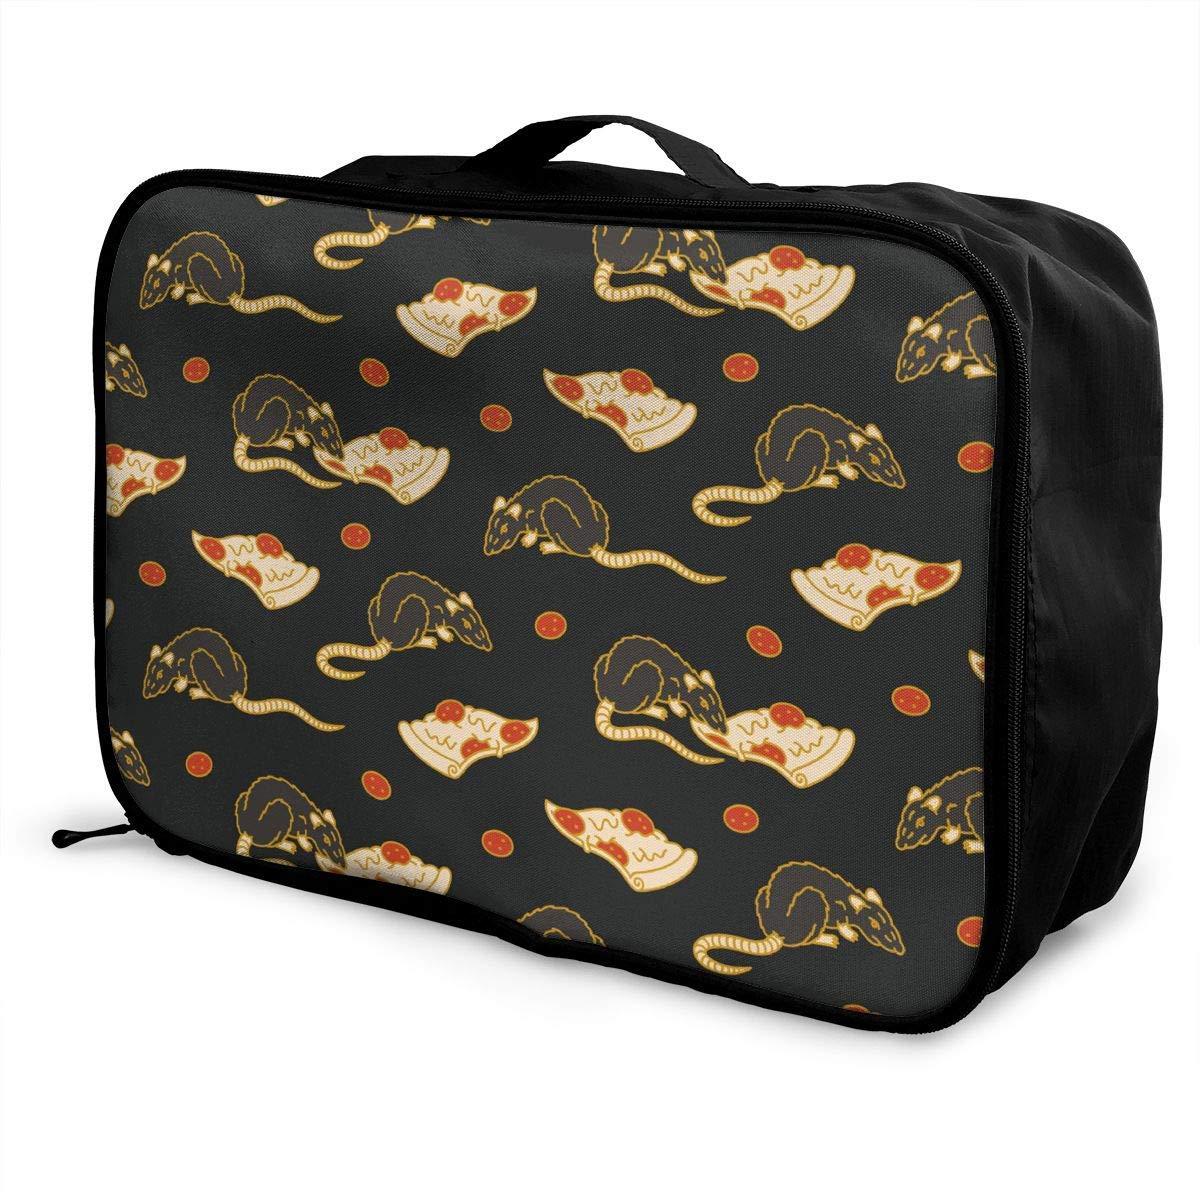 Travel Duffel Bag Waterproof Fashion Lightweight Large Capacity Portable Duffel Bag for Men /& Women Pizza Rat JTRVW Luggage Bags for Travel